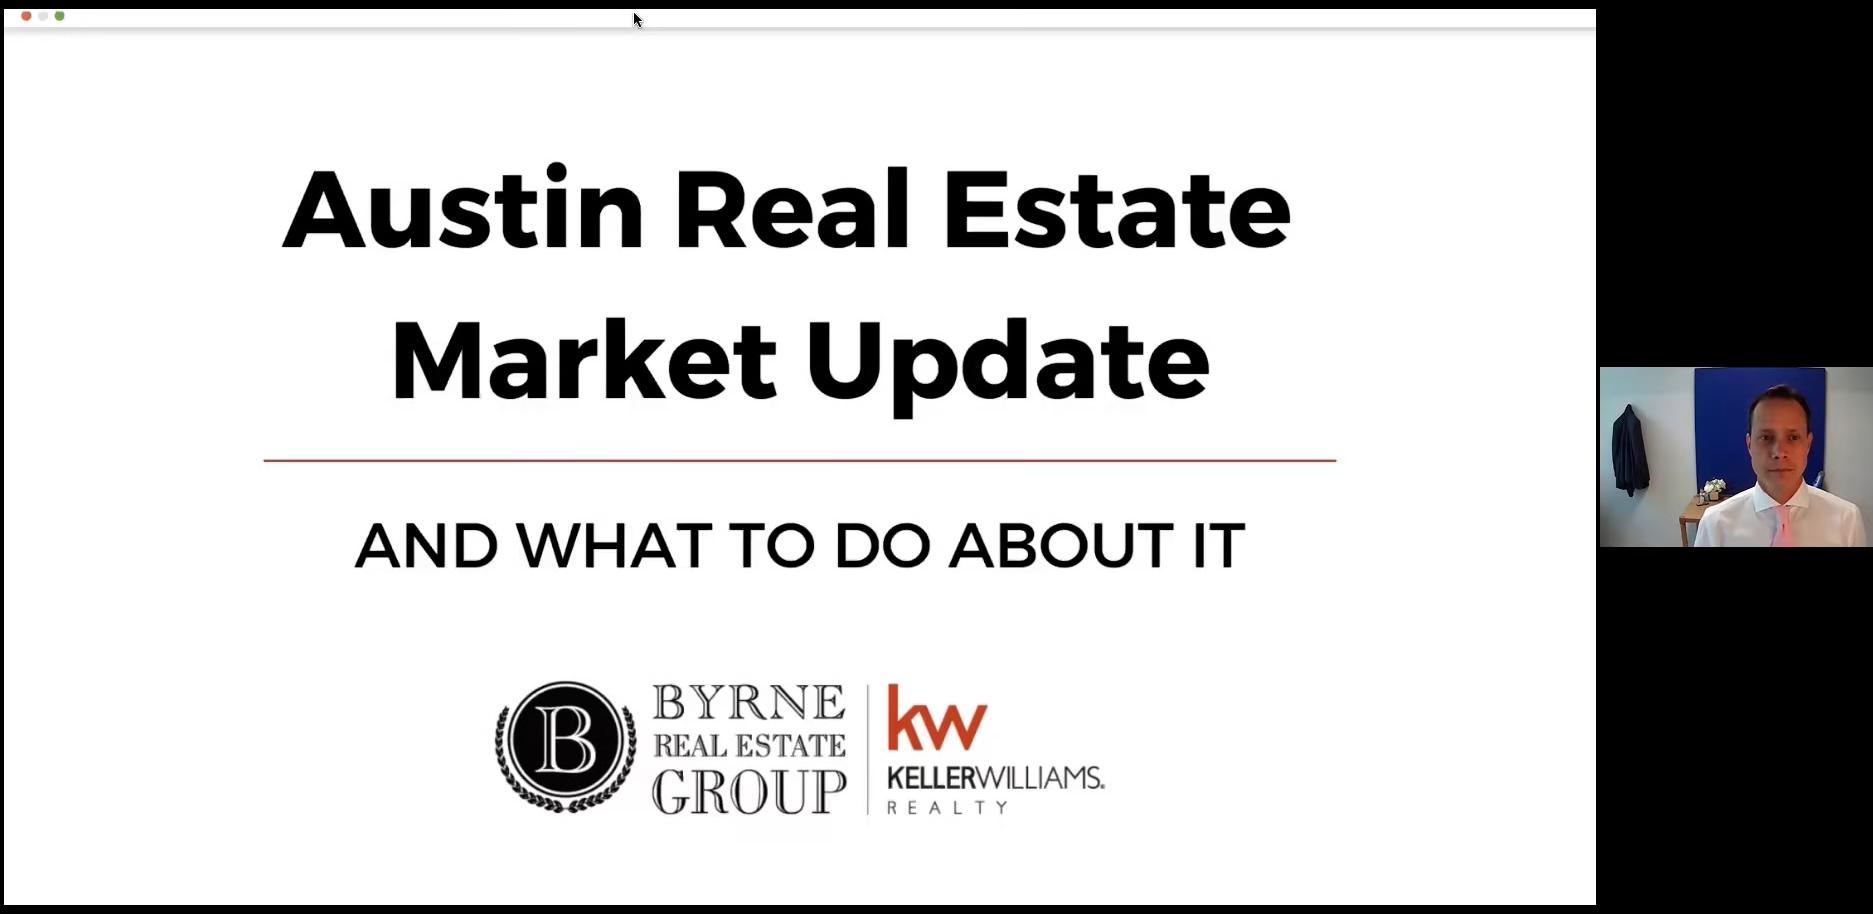 The Austin Real Estate Webinar